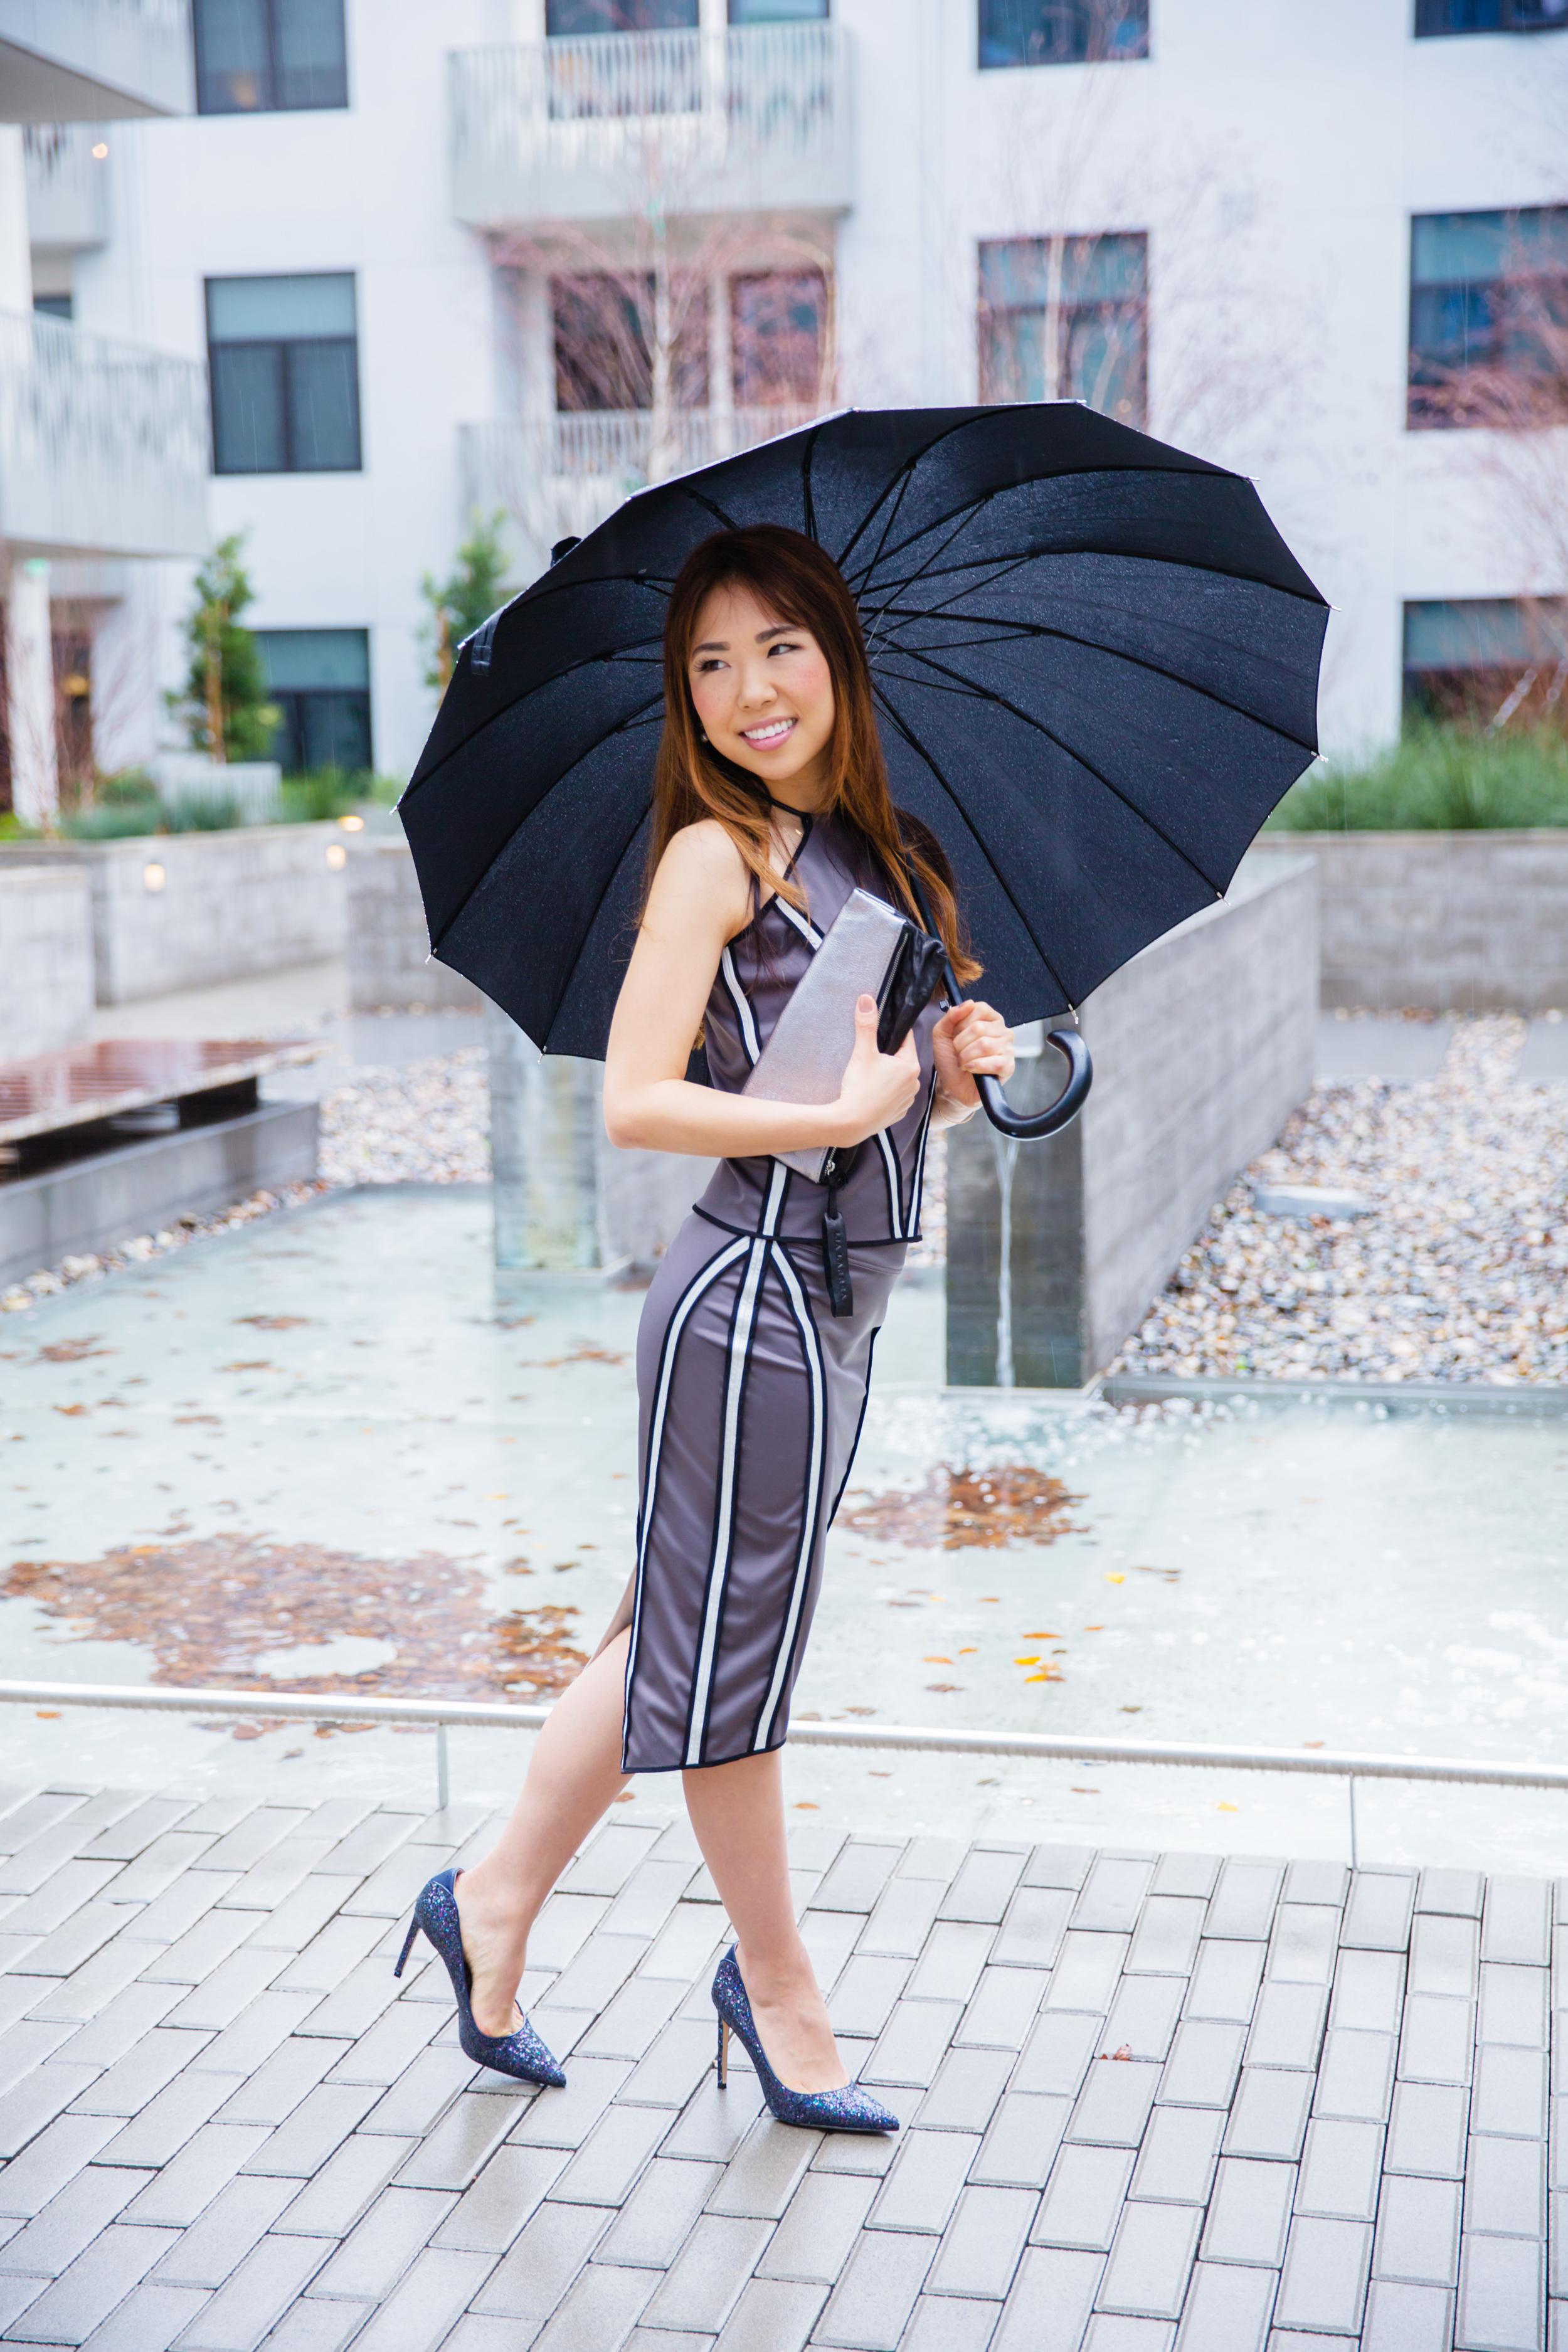 AW16 Zuria HalterTop & Brea Pencil Skirt (Reversible/Water Resistant), Tara Clutch